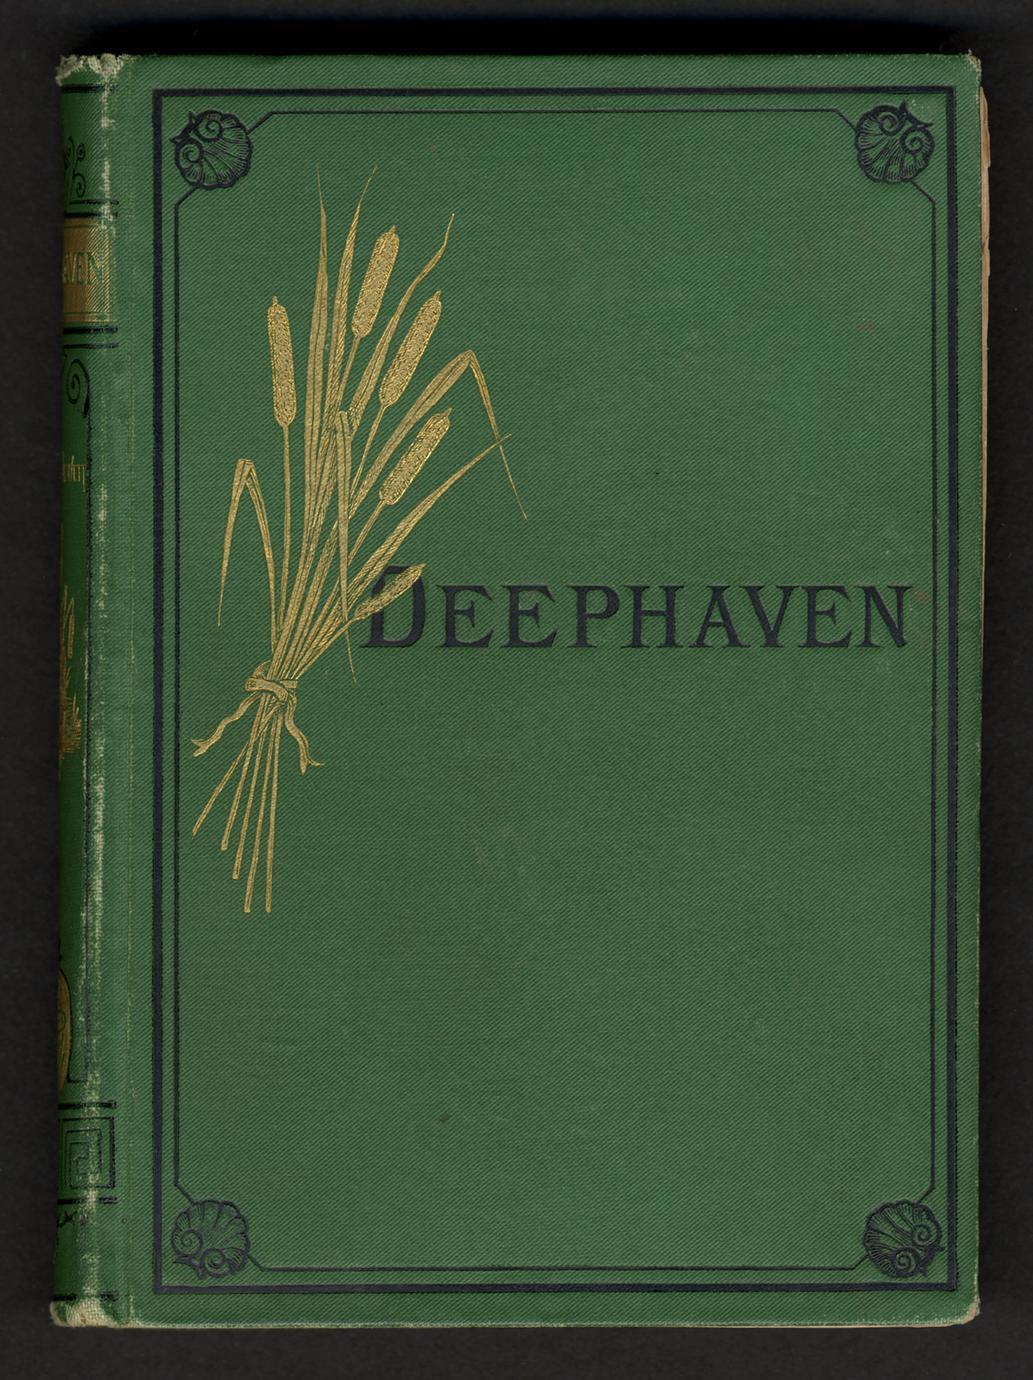 Deephaven (1 of 3)